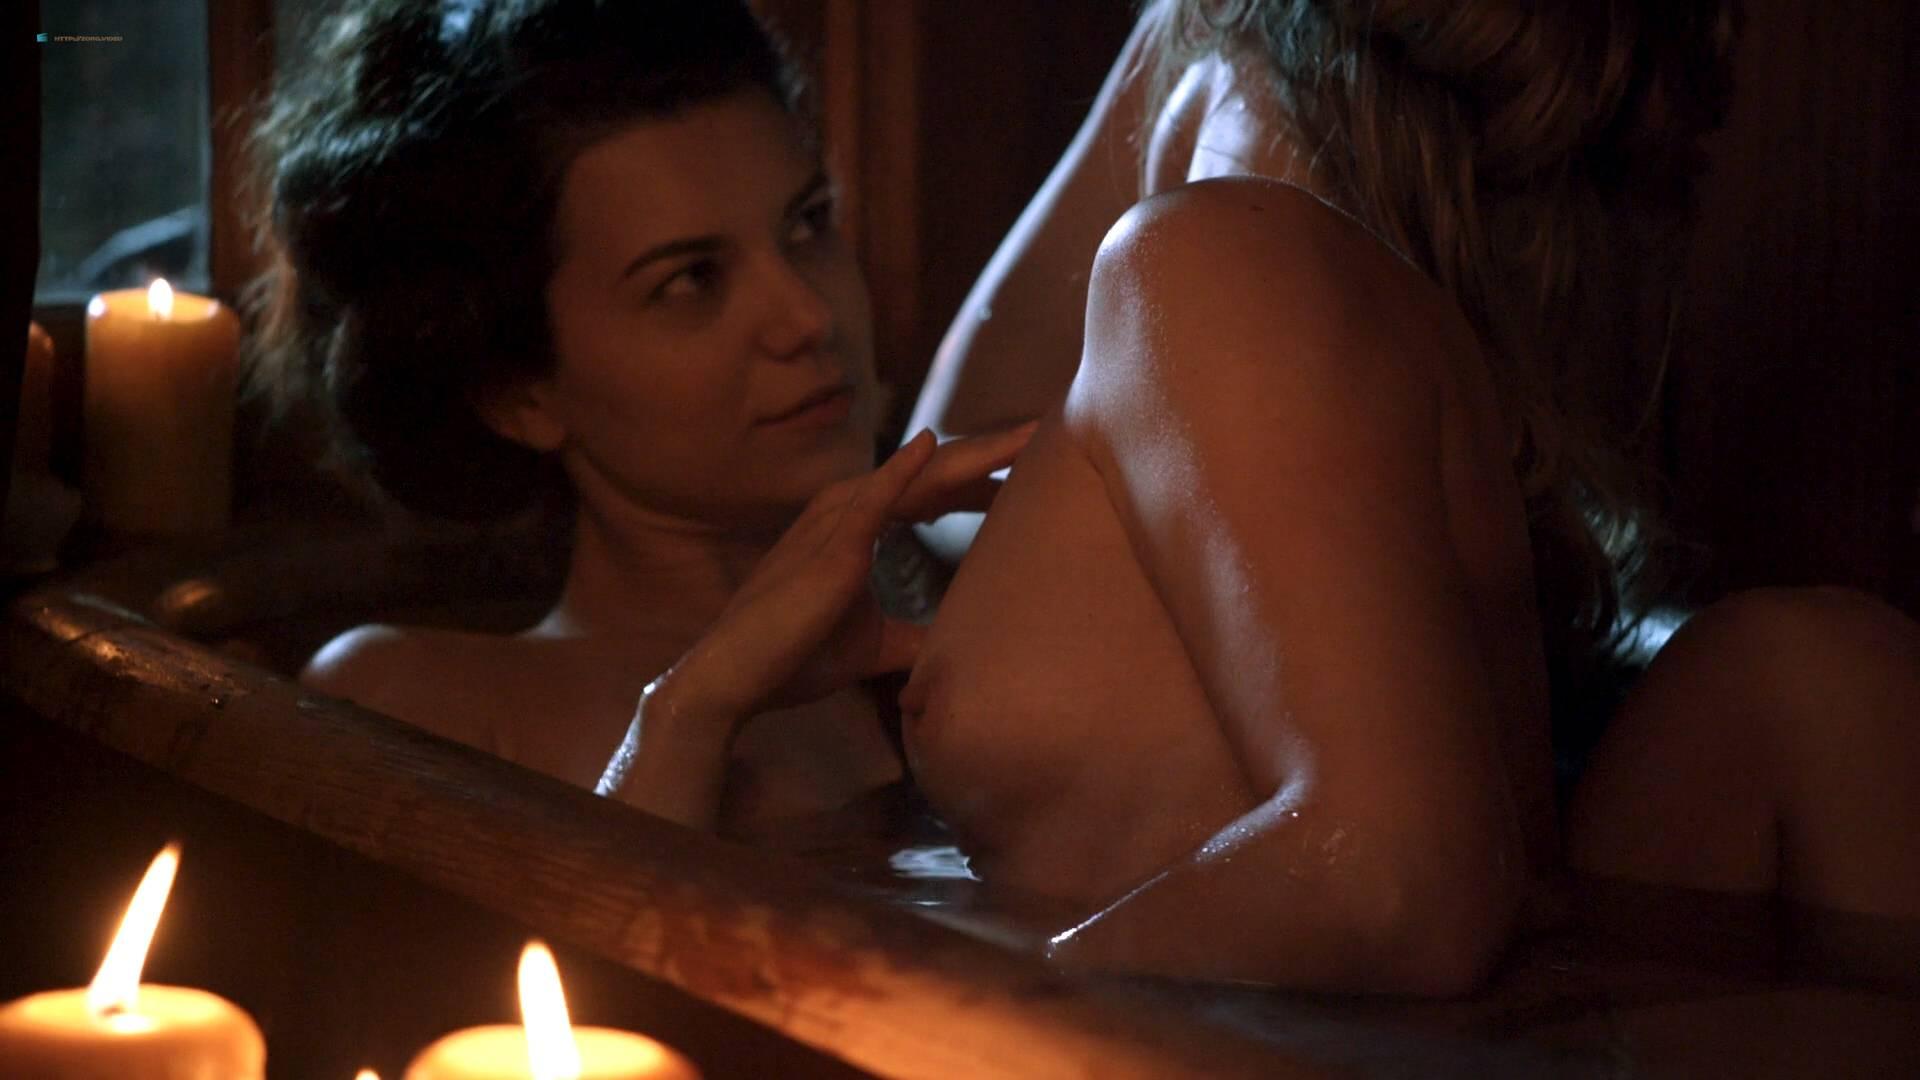 Elizabeth Lavender nude topless Elysia Rotaru nude butt boobs - Dead Again in Tombstone (2017) HD 1080p BluRay (3)